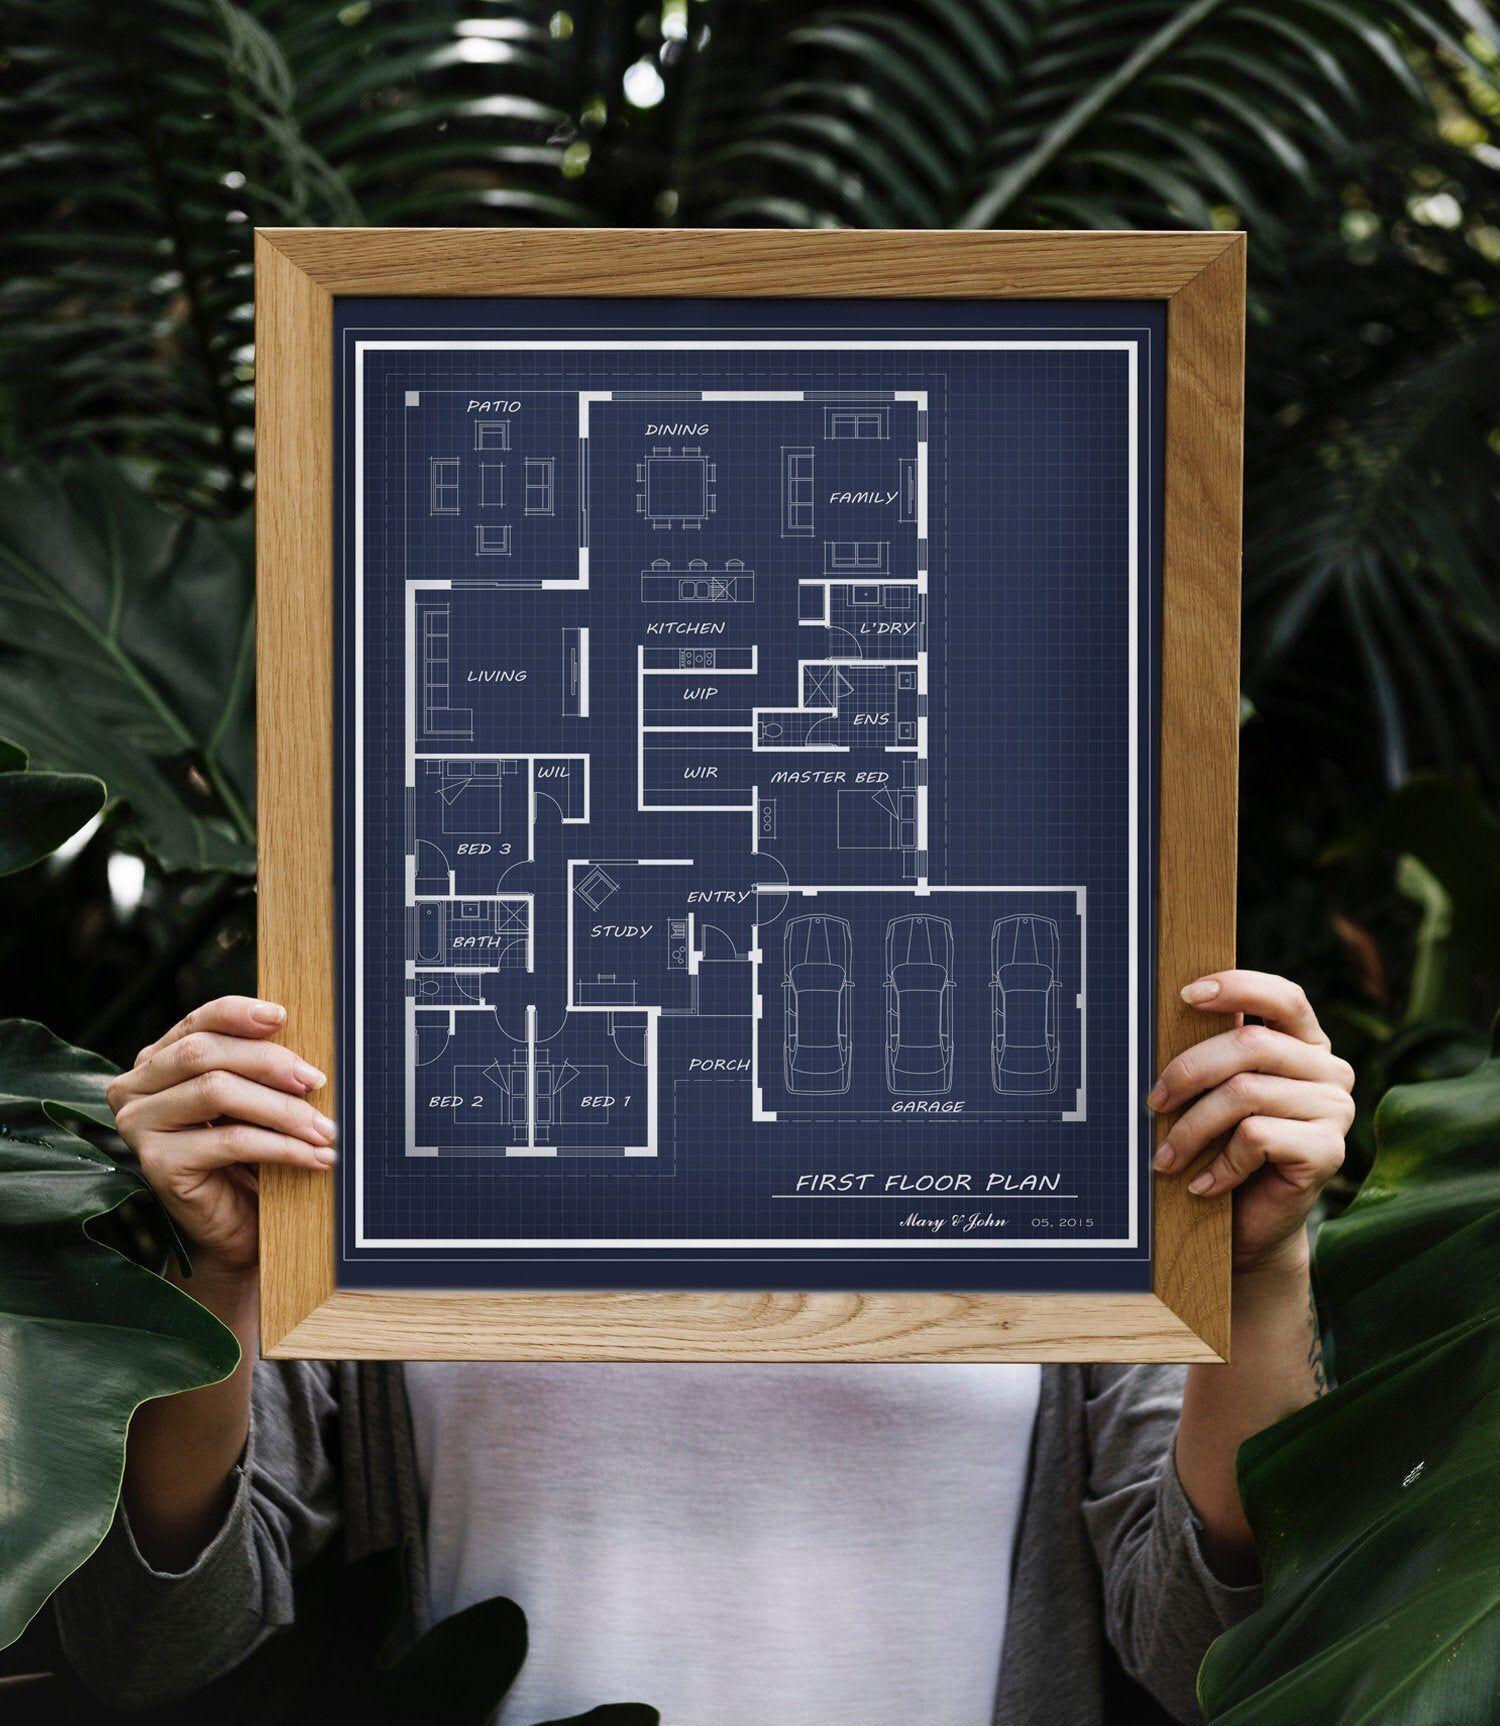 Custom Digital Floor Plan Artwork Blueprint Floor Plan Etsy How To Plan First Home Gifts Floor Plan Drawing